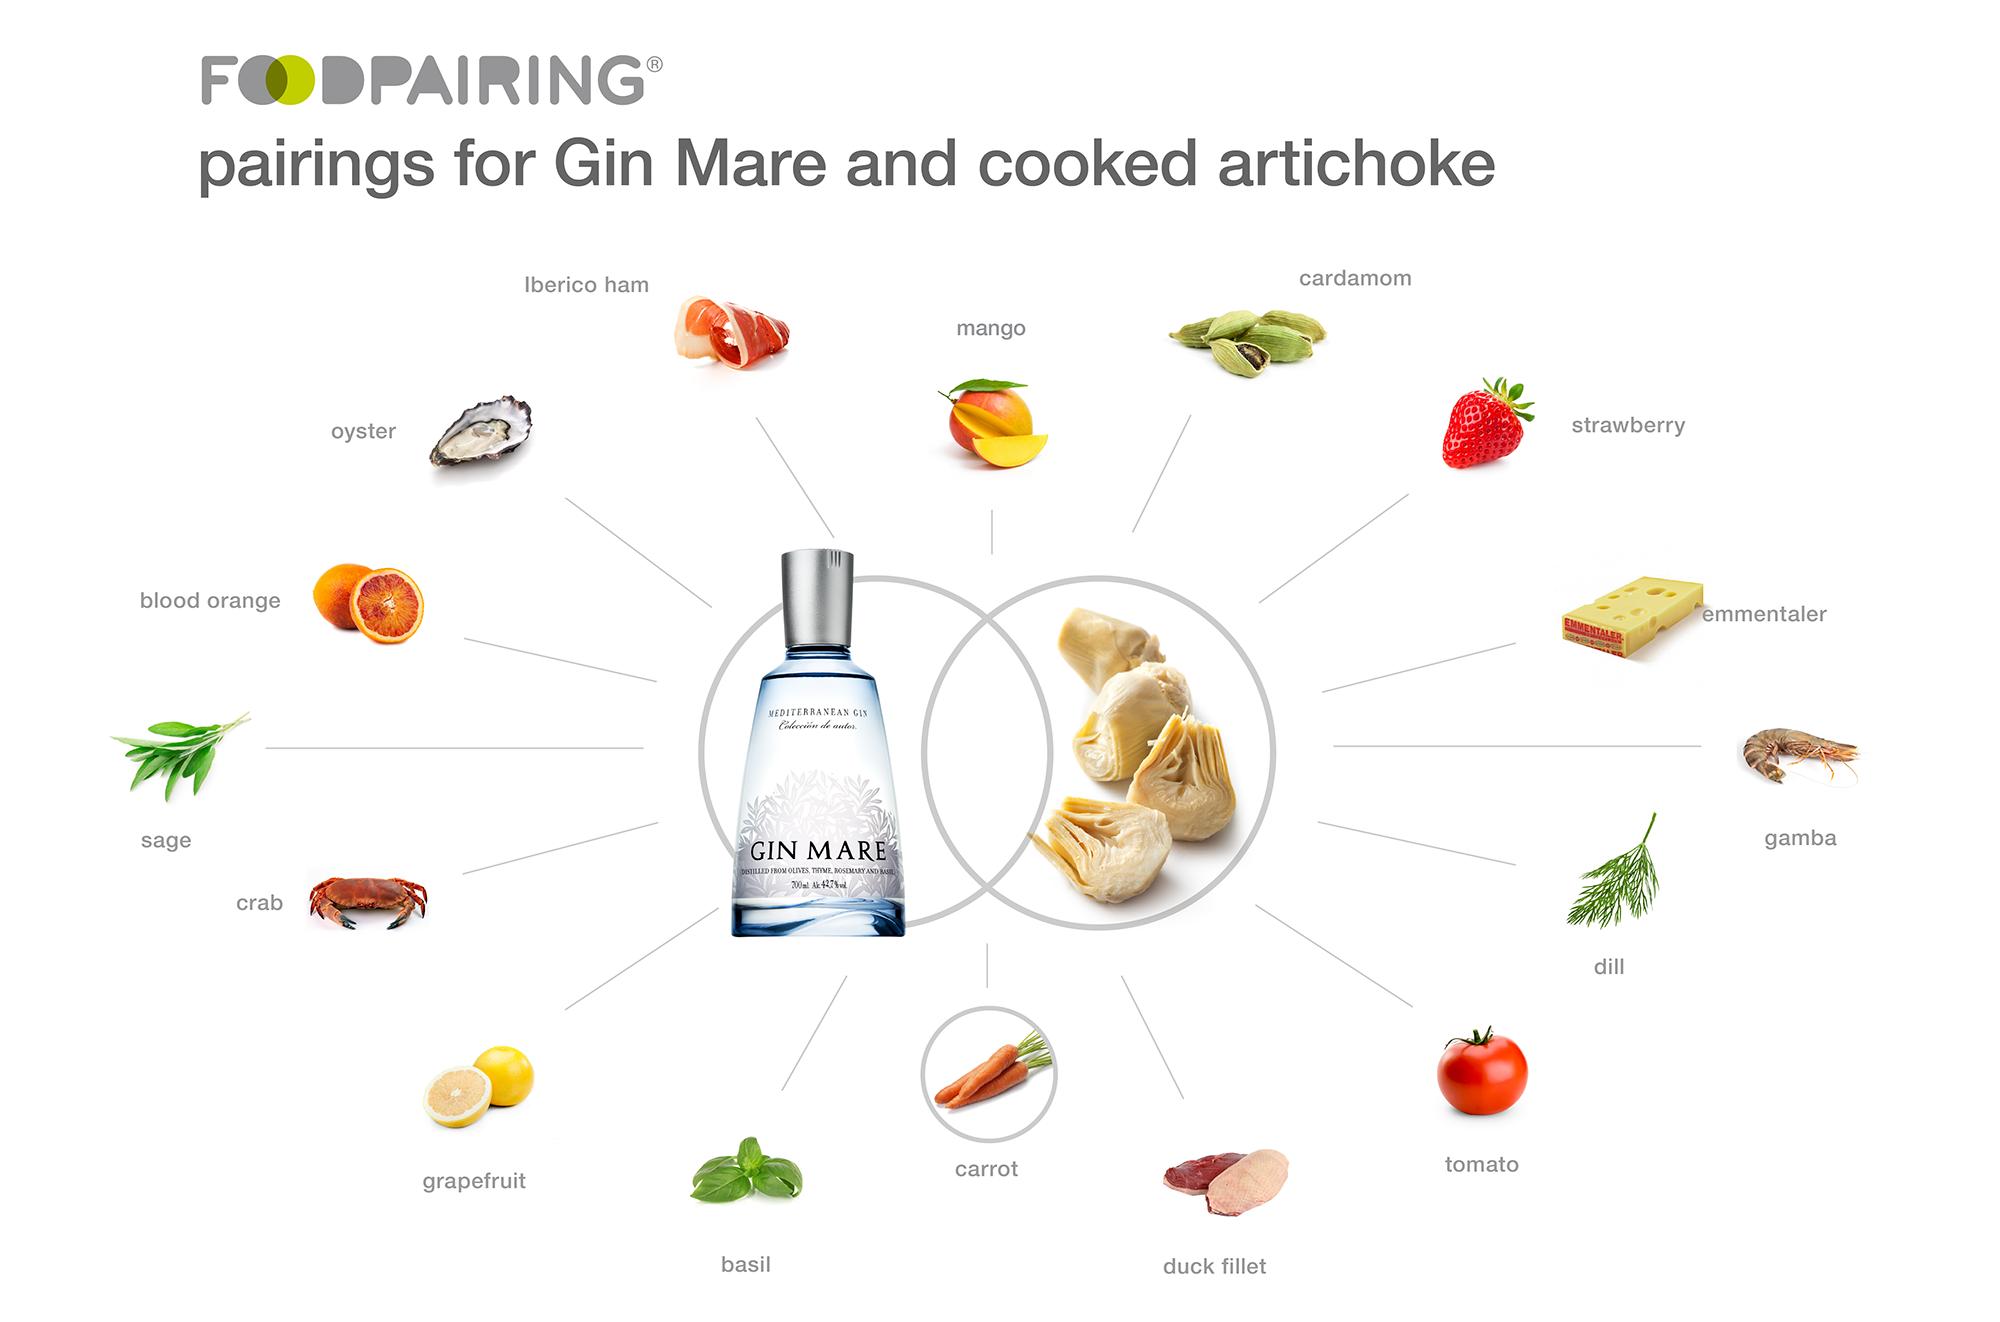 http://blog-assets.foodpairing.com/2017/03/Gin-Mare-Artichoke-best-pairings-02.png